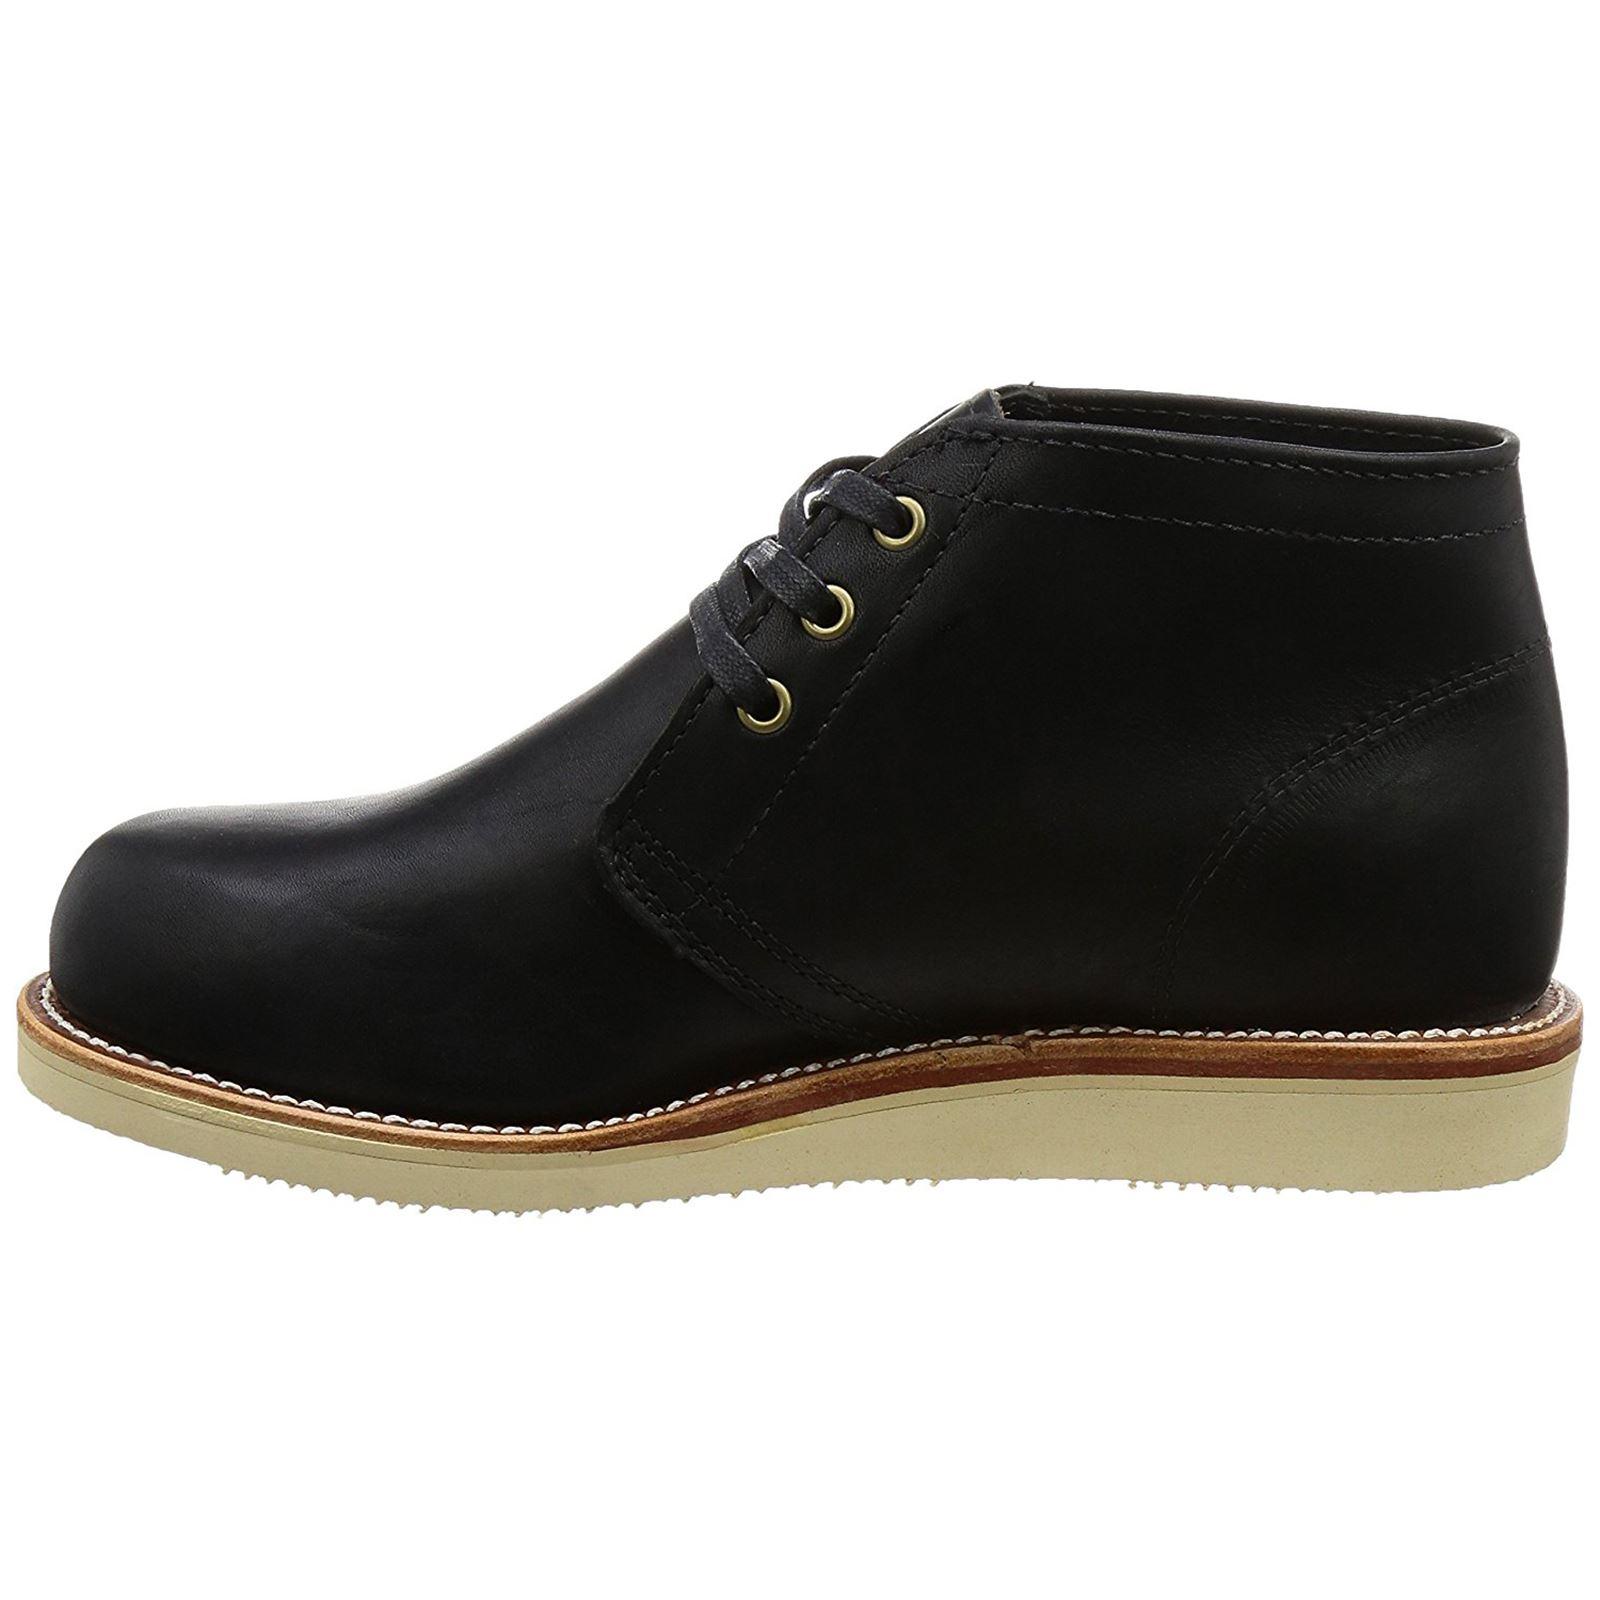 Chippewa-1955-Original-Modern-Suburban-Black-Mens-Leather-Chukka-Boots